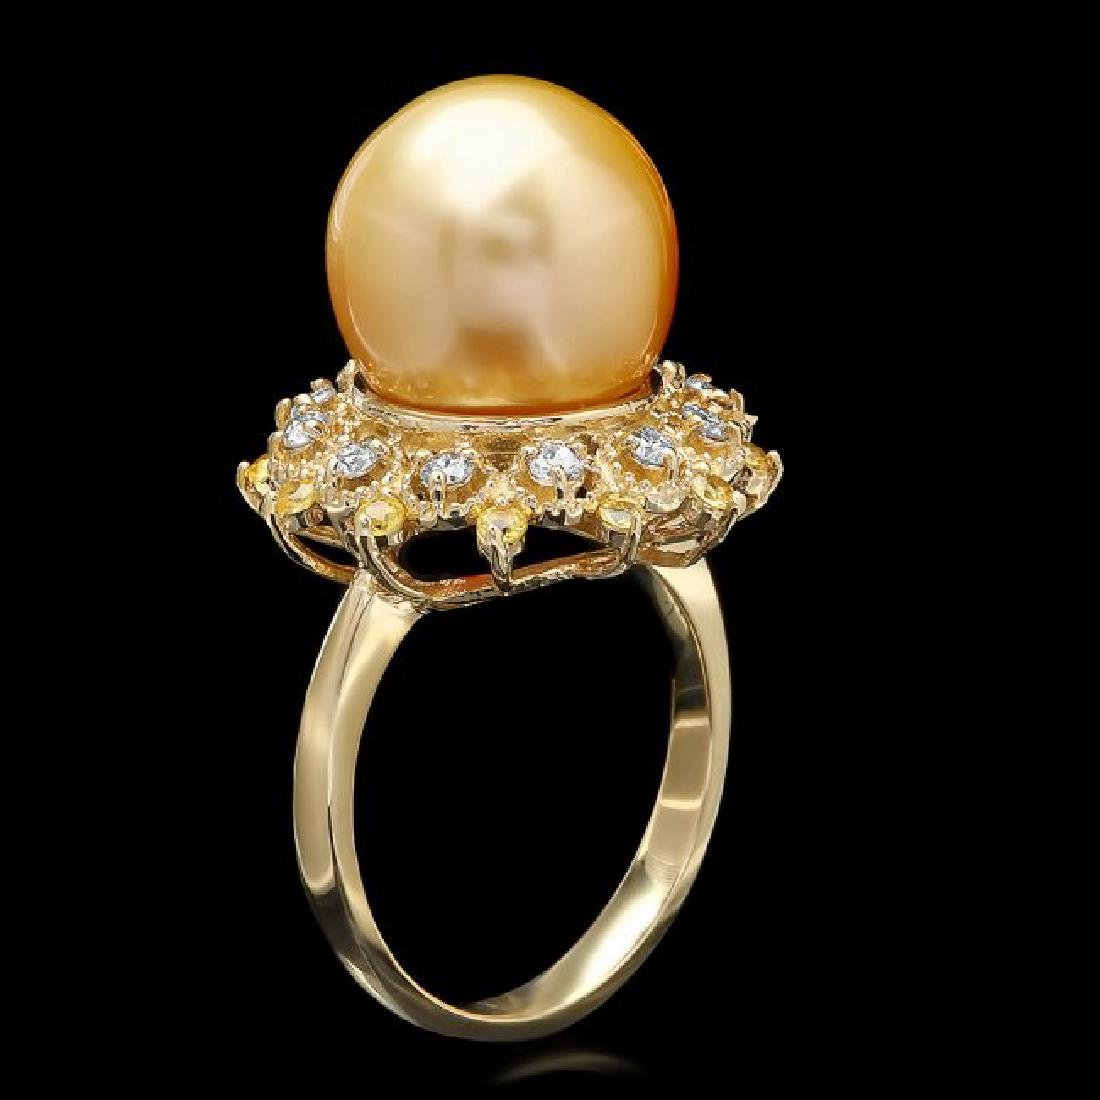 14k Yellow Gold 12mm Pearl 0.40ct Diamond Ring - 2